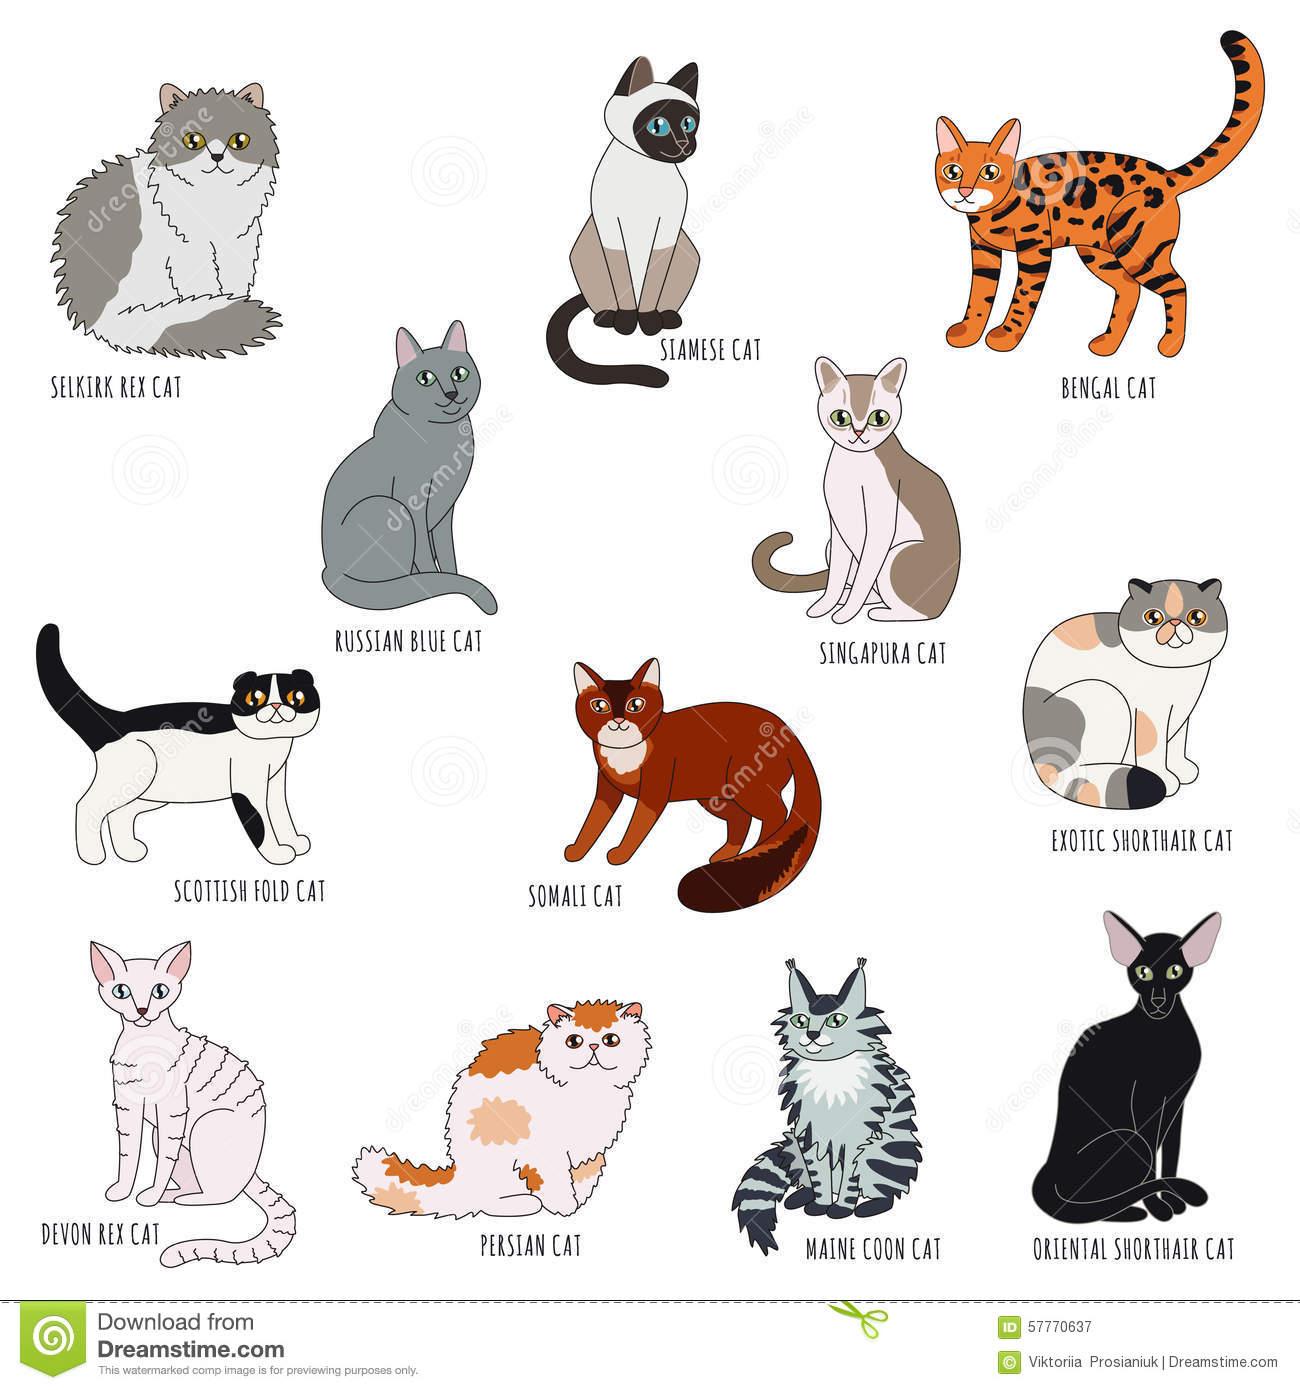 Cat Breeds ThingLink